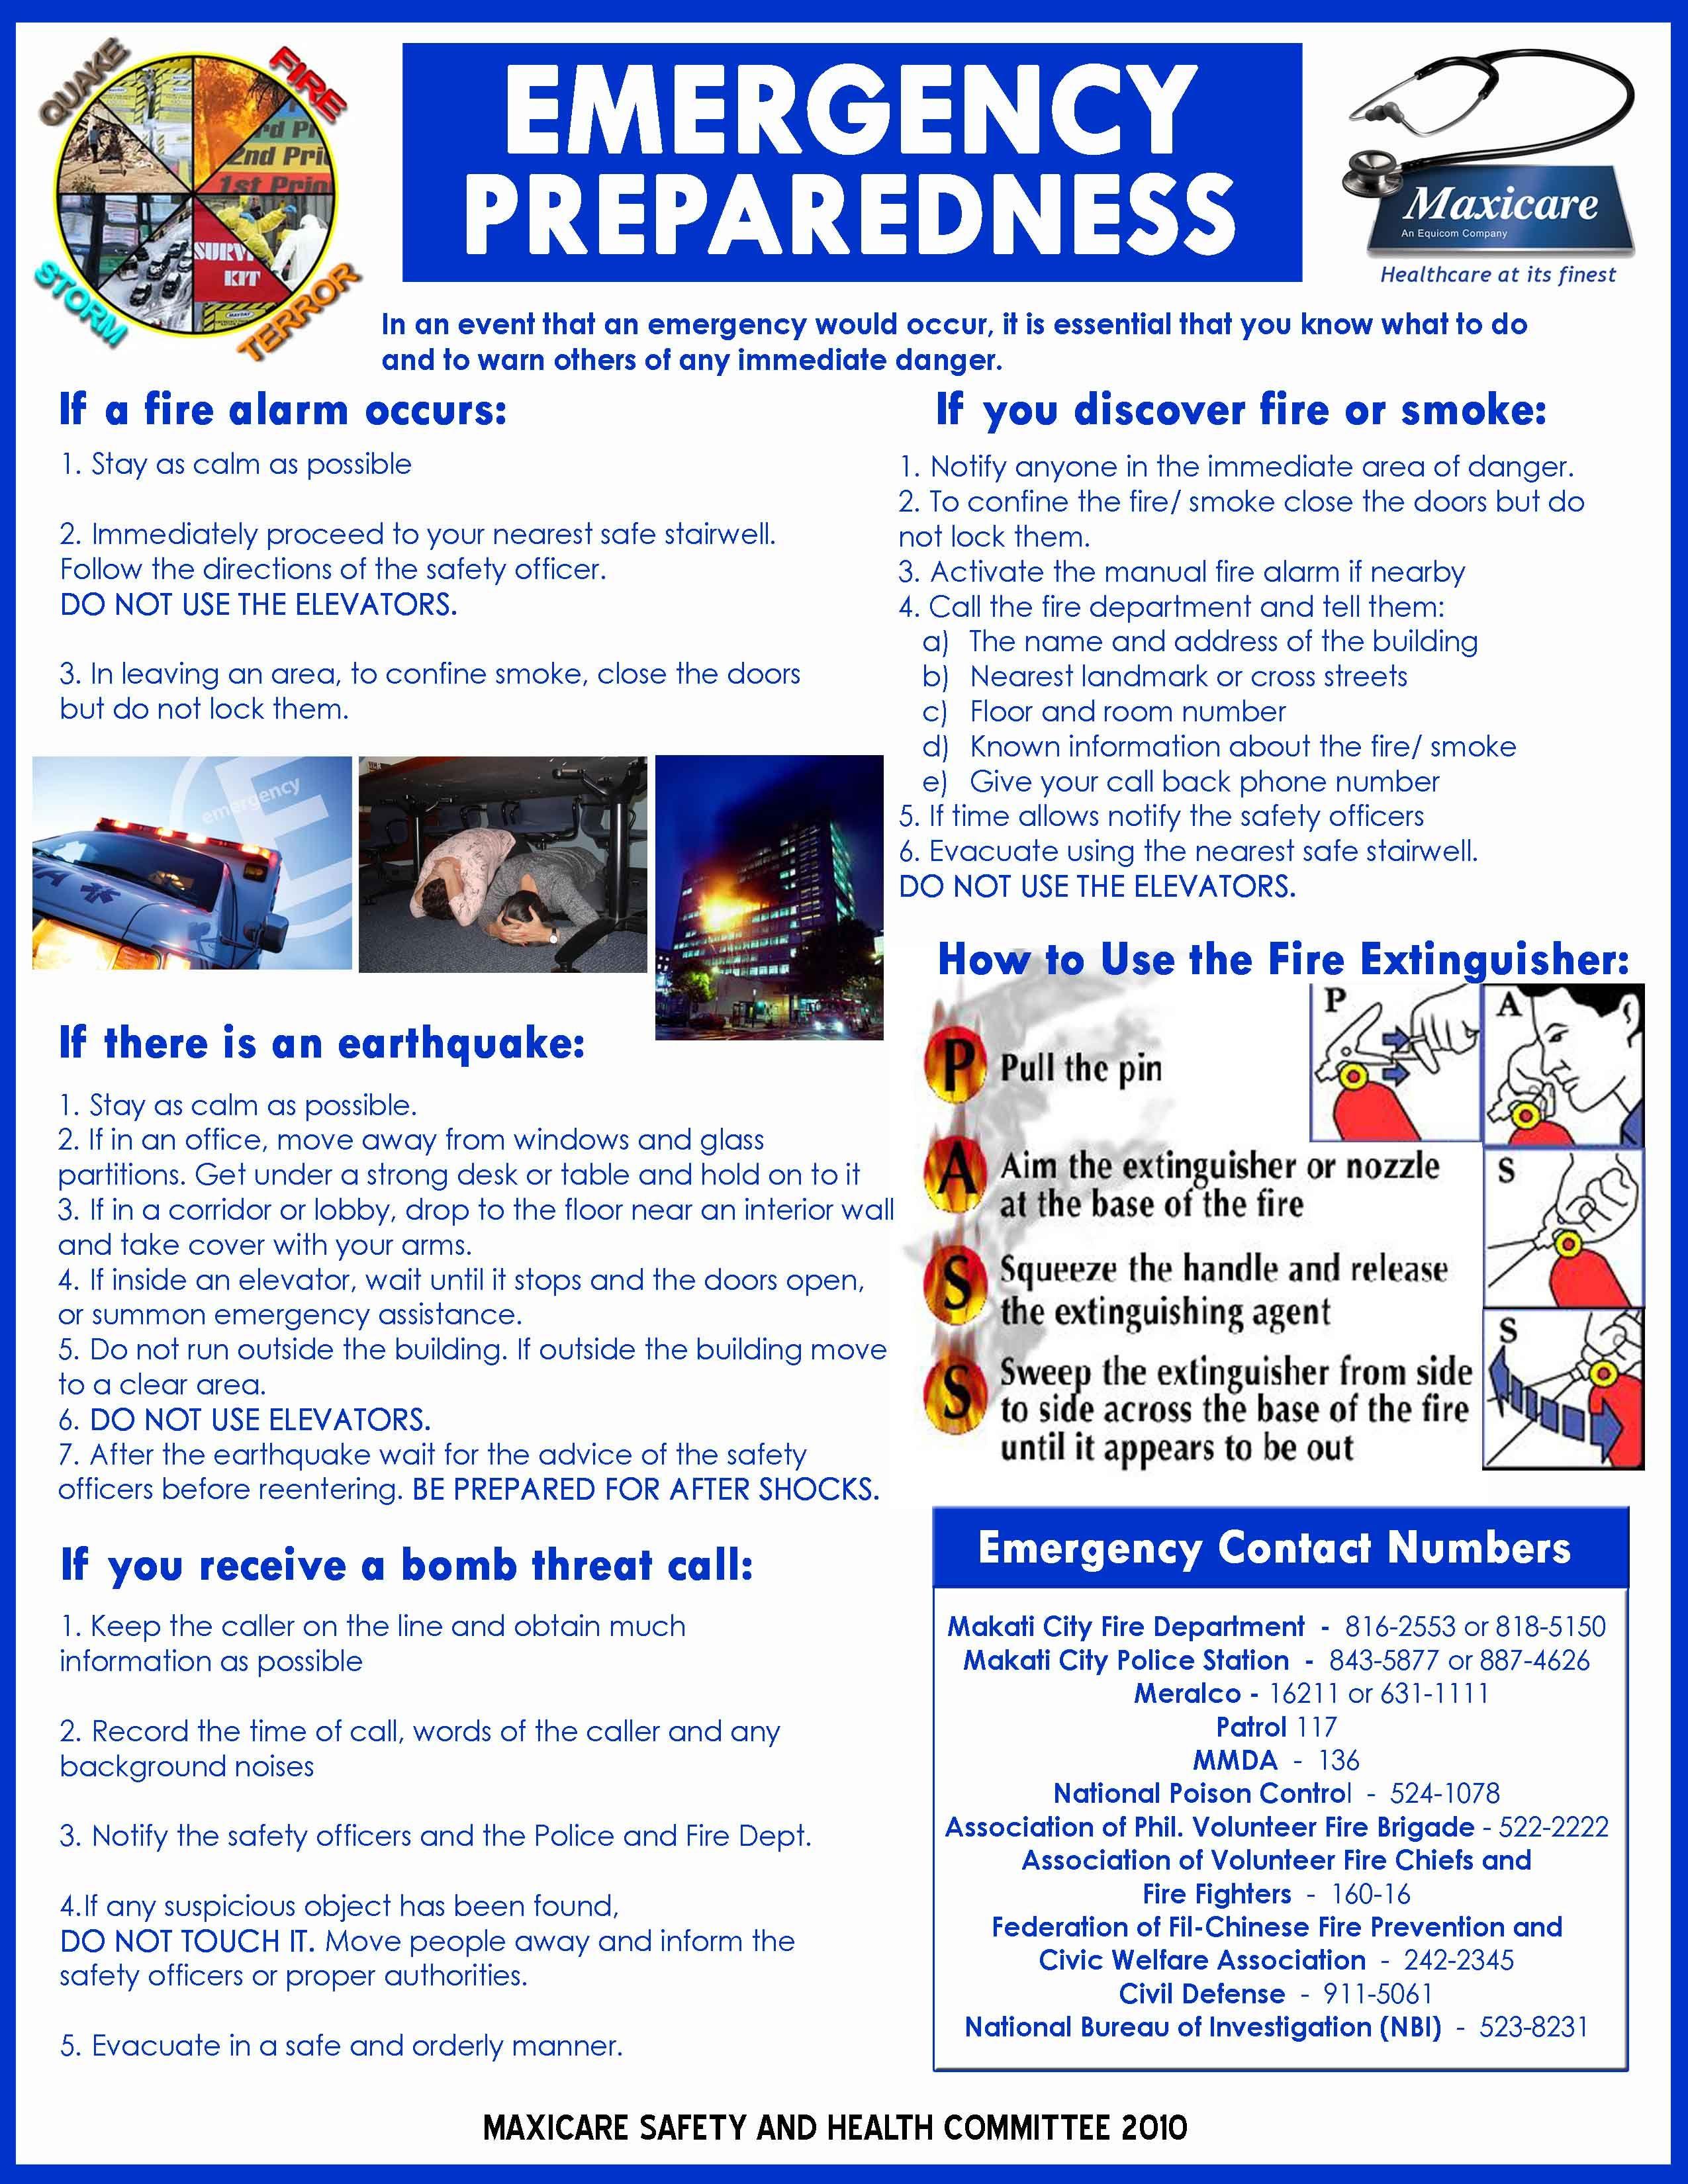 Emergency Preparedness Info From A Company